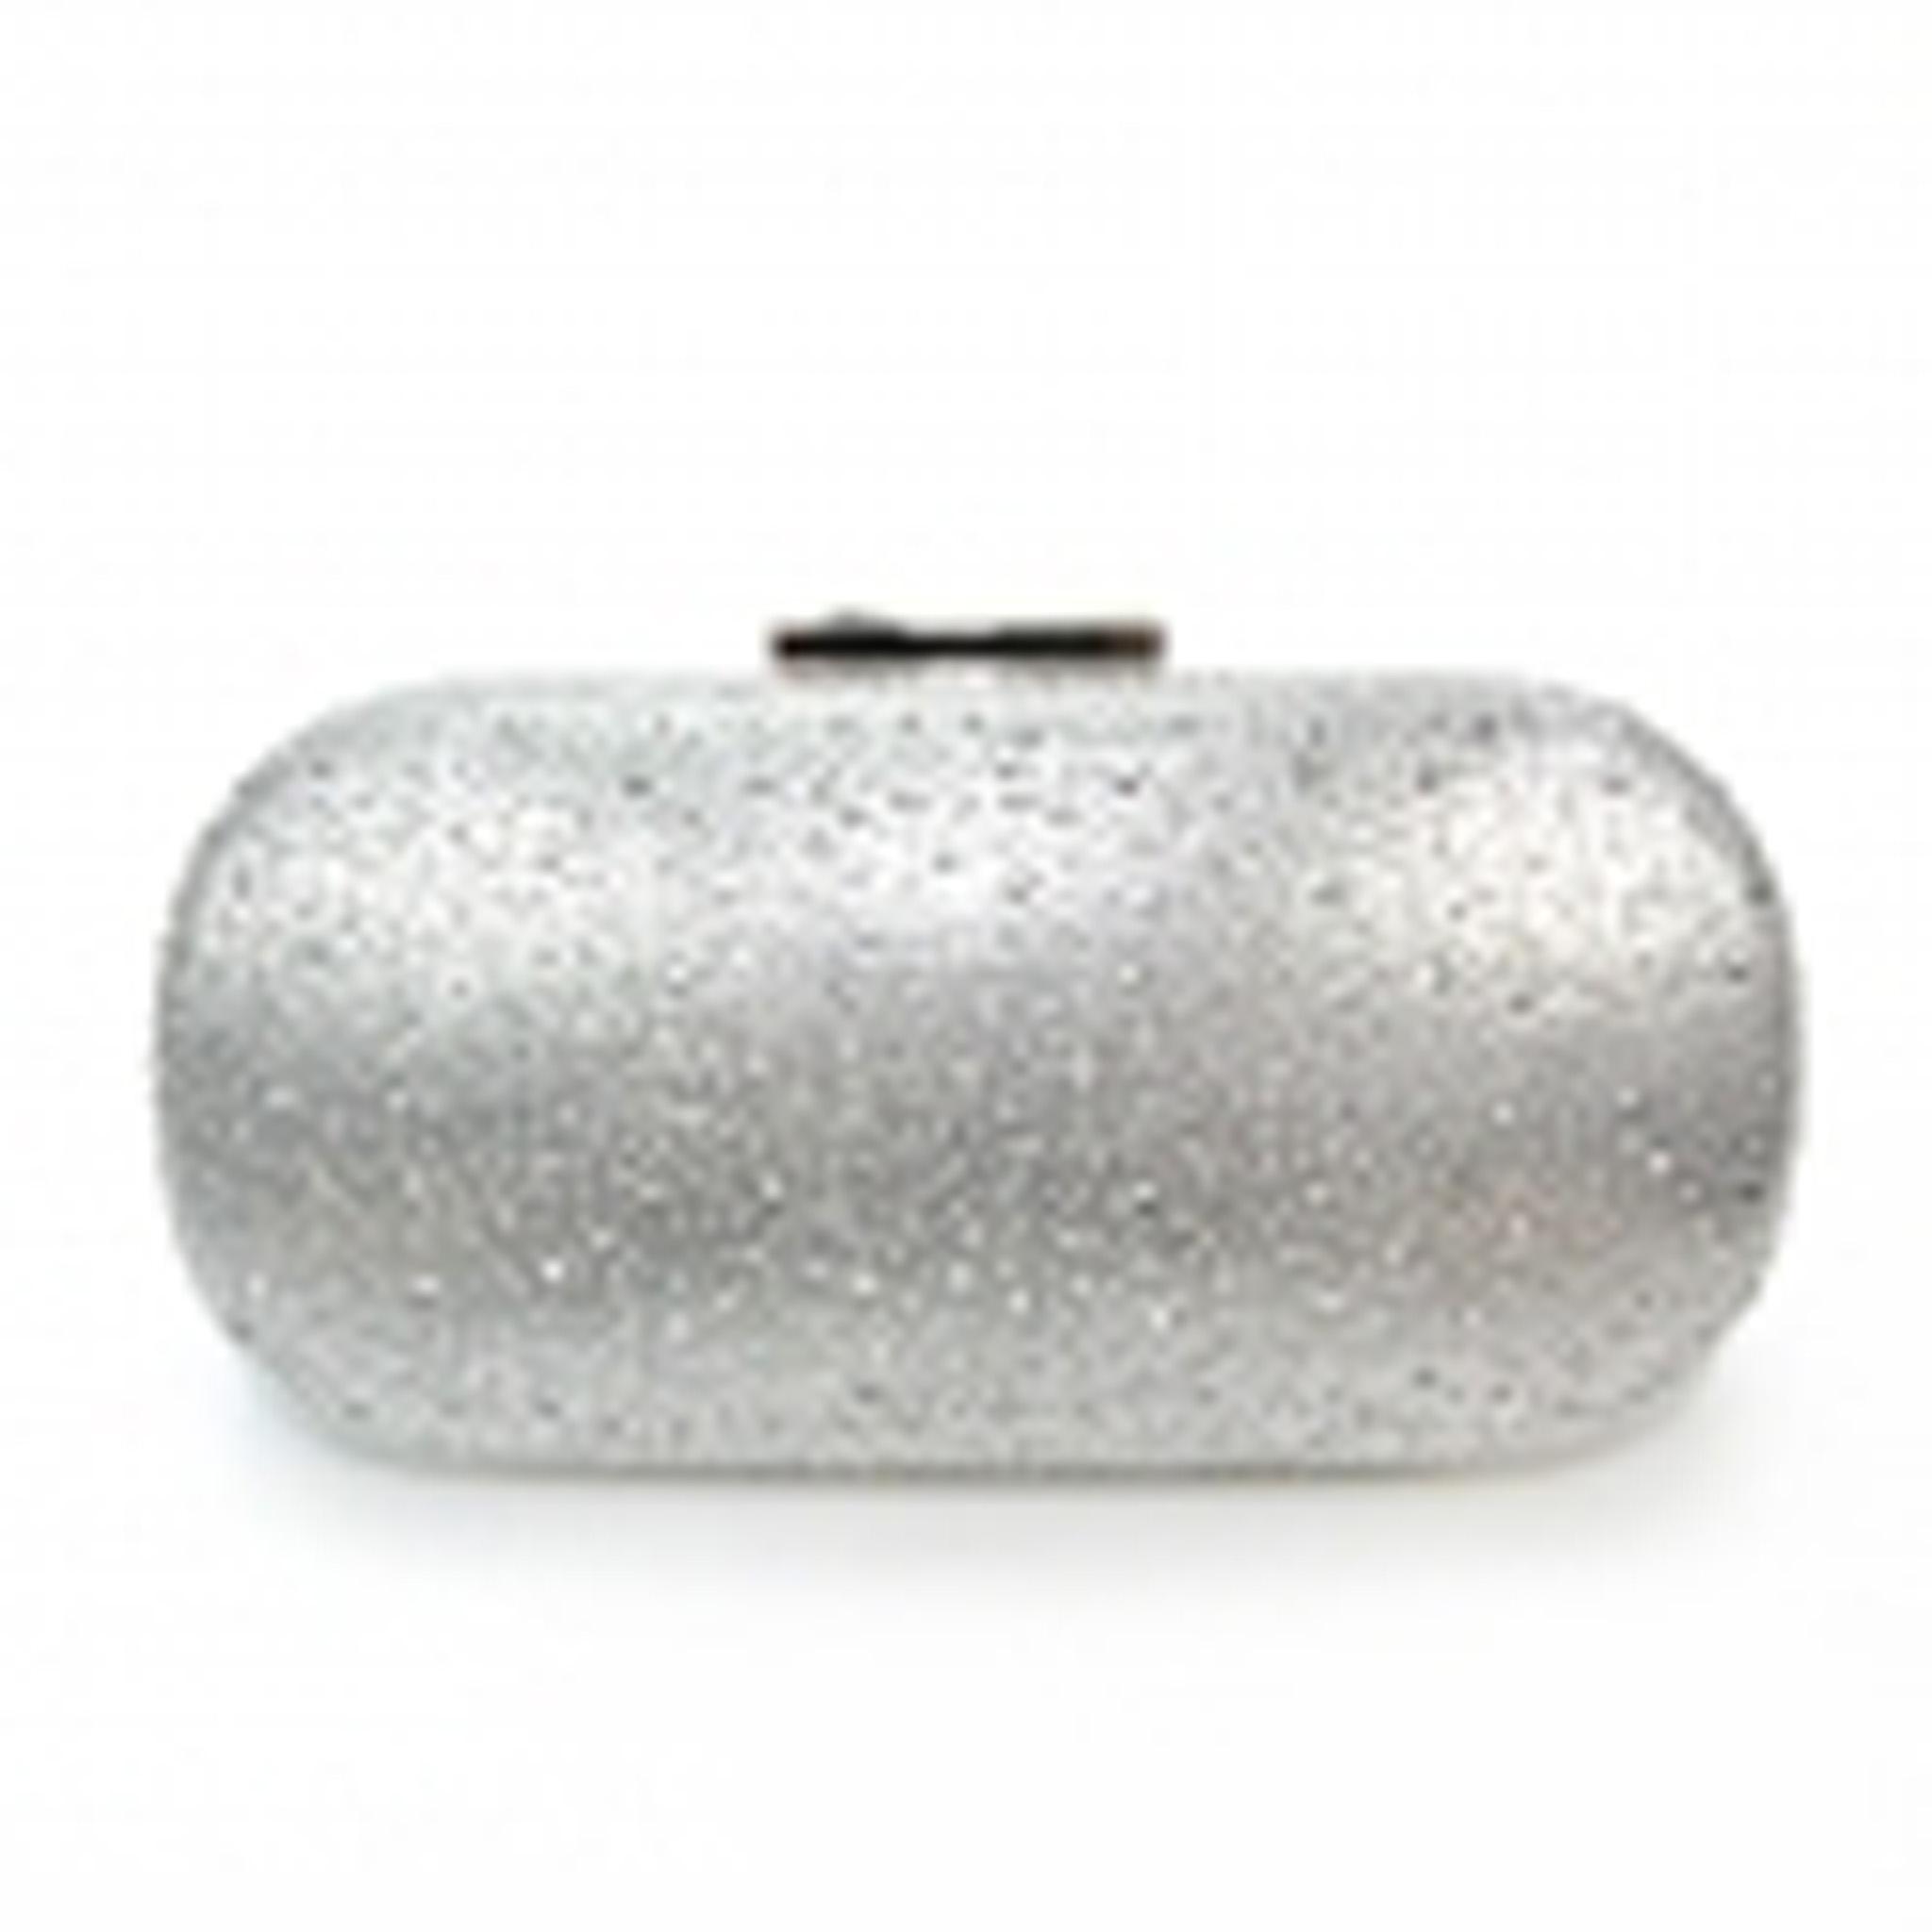 sense-oval-gemstone-clutch-bag-p4184-246